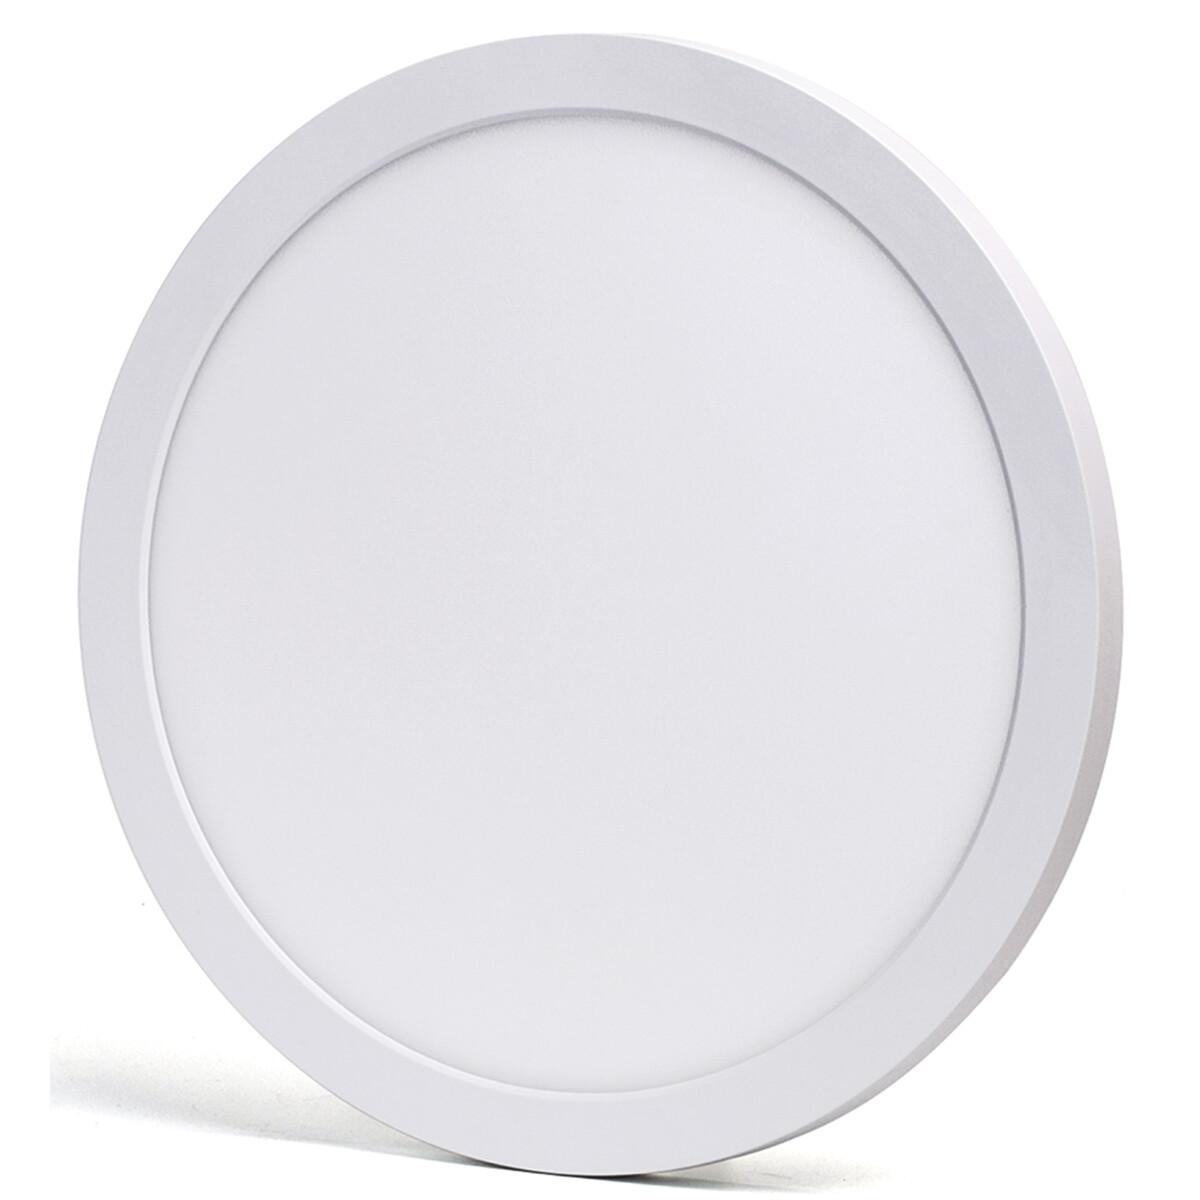 LED Downlight Pro - Aigi Foka - Inbouw/Opbouw - Rond - 24W - Aanpasbare Kleur CCT - Mat Wit - Kunststof